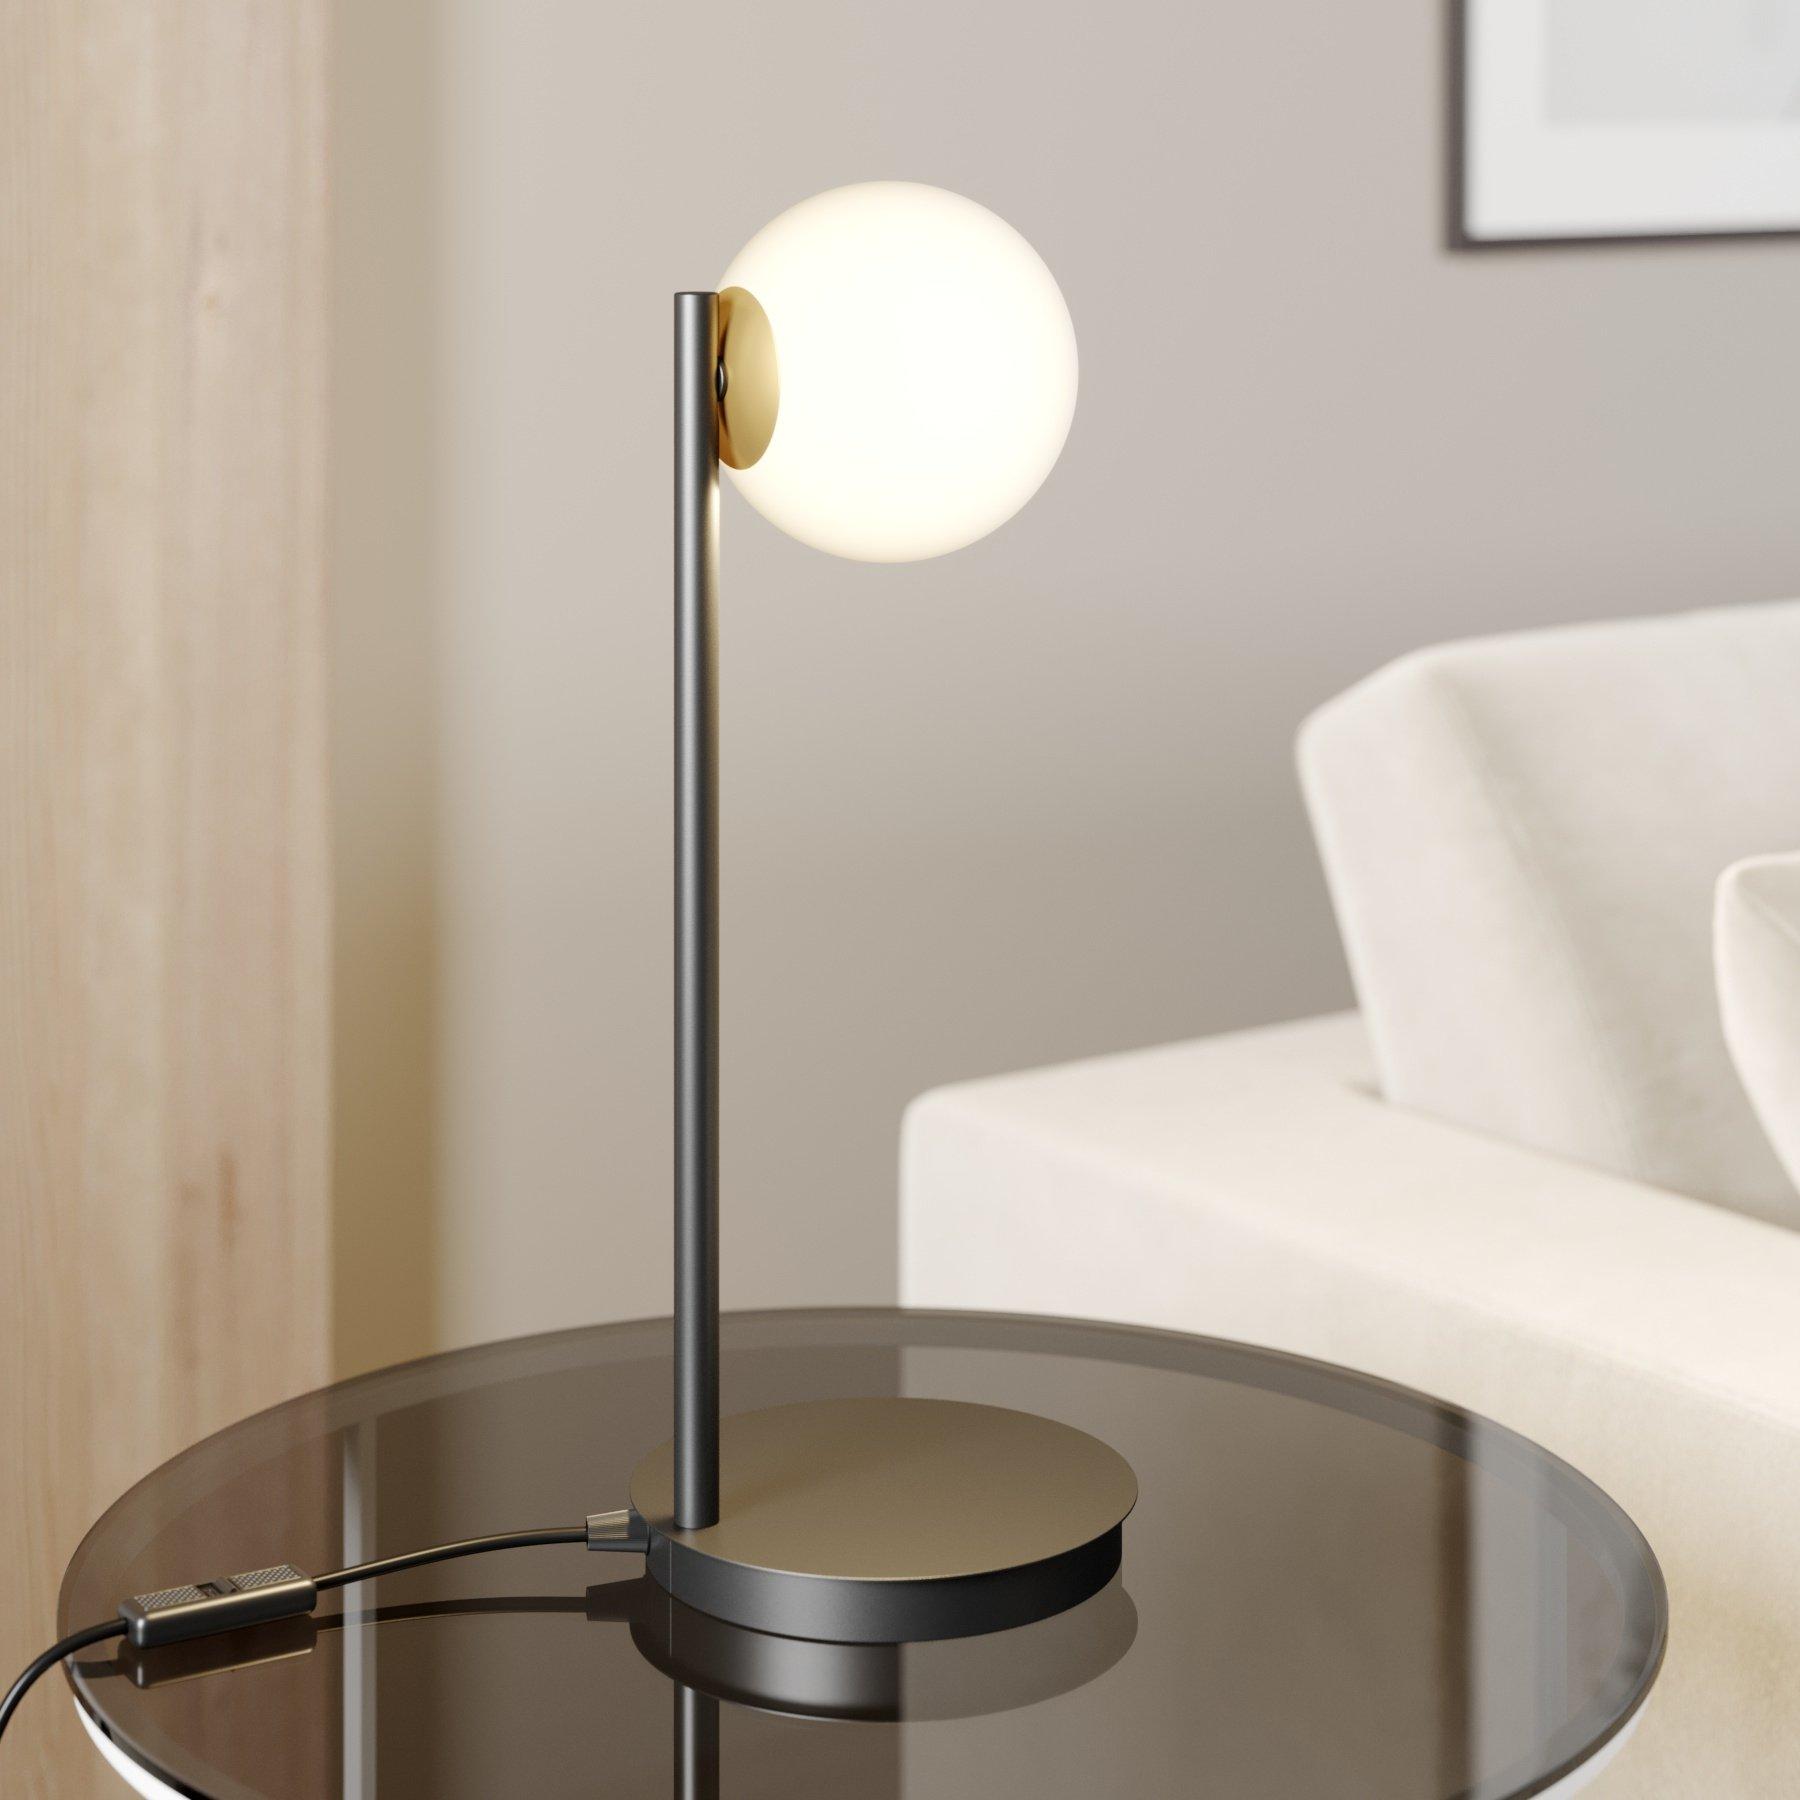 Bordlampe Gama i svart med glasskule